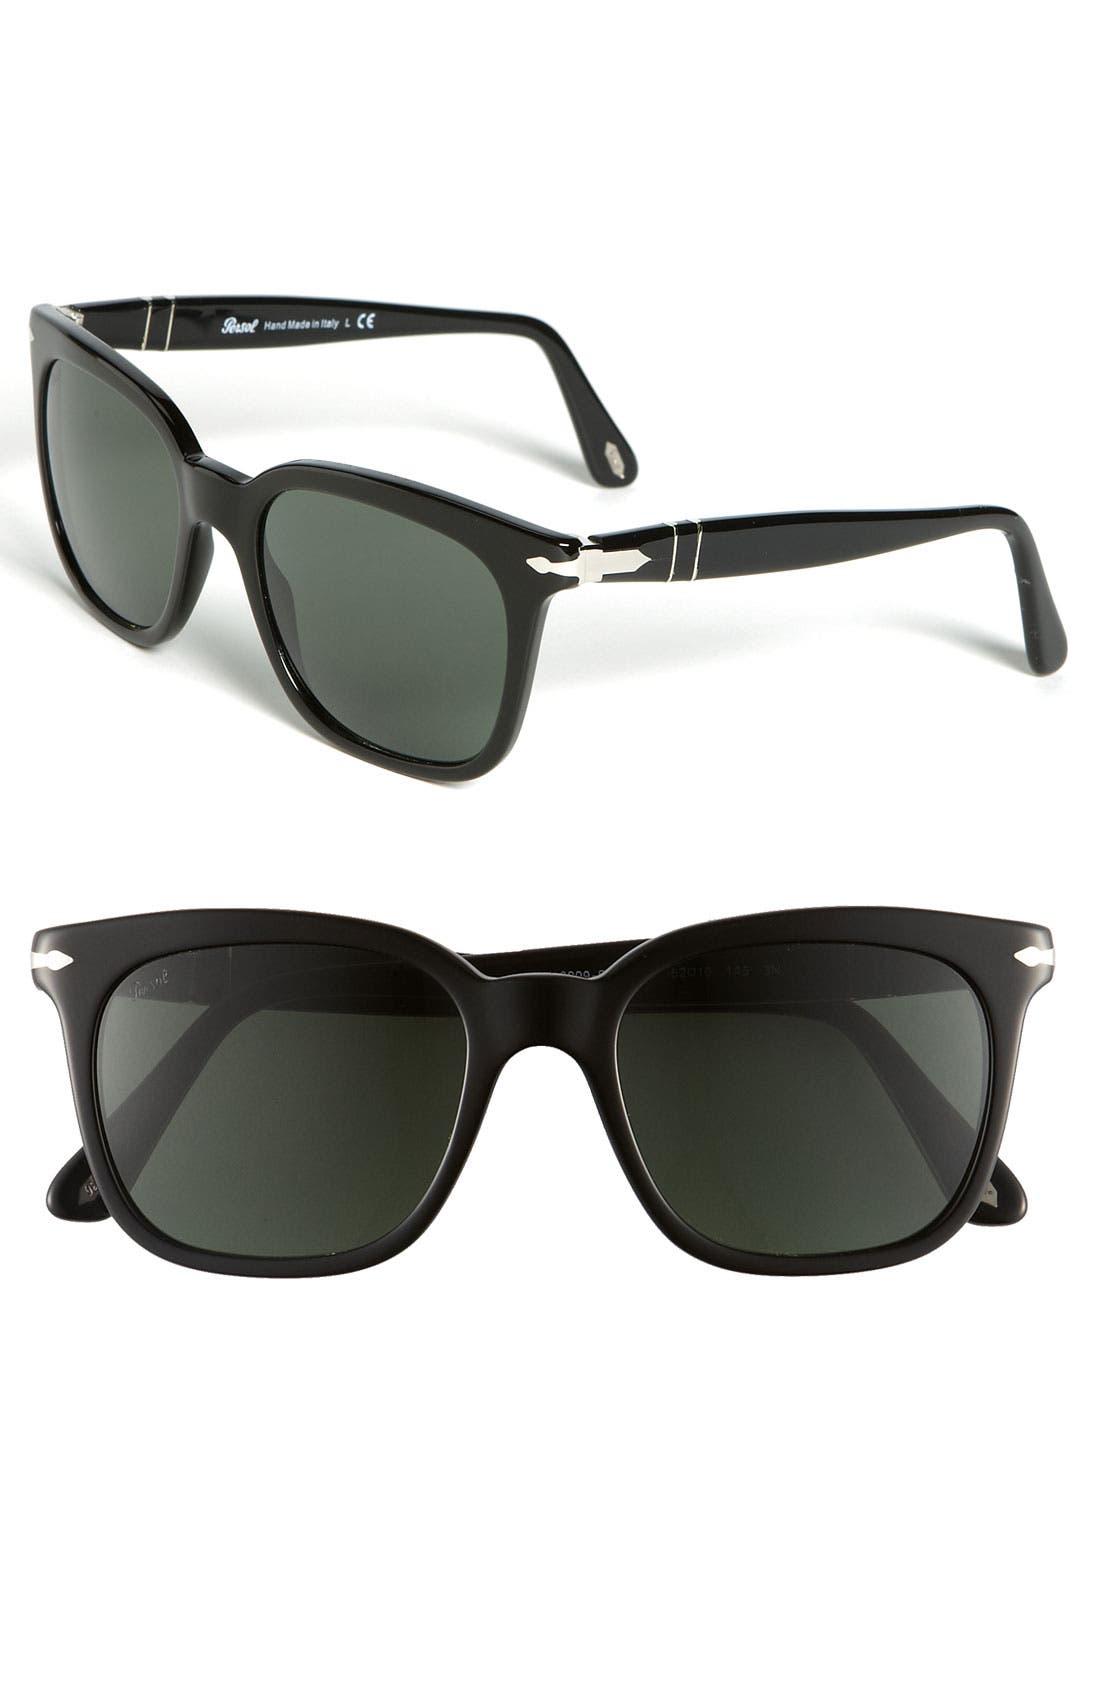 Alternate Image 1 Selected - Persol 50mm Square Vintage Sunglasses